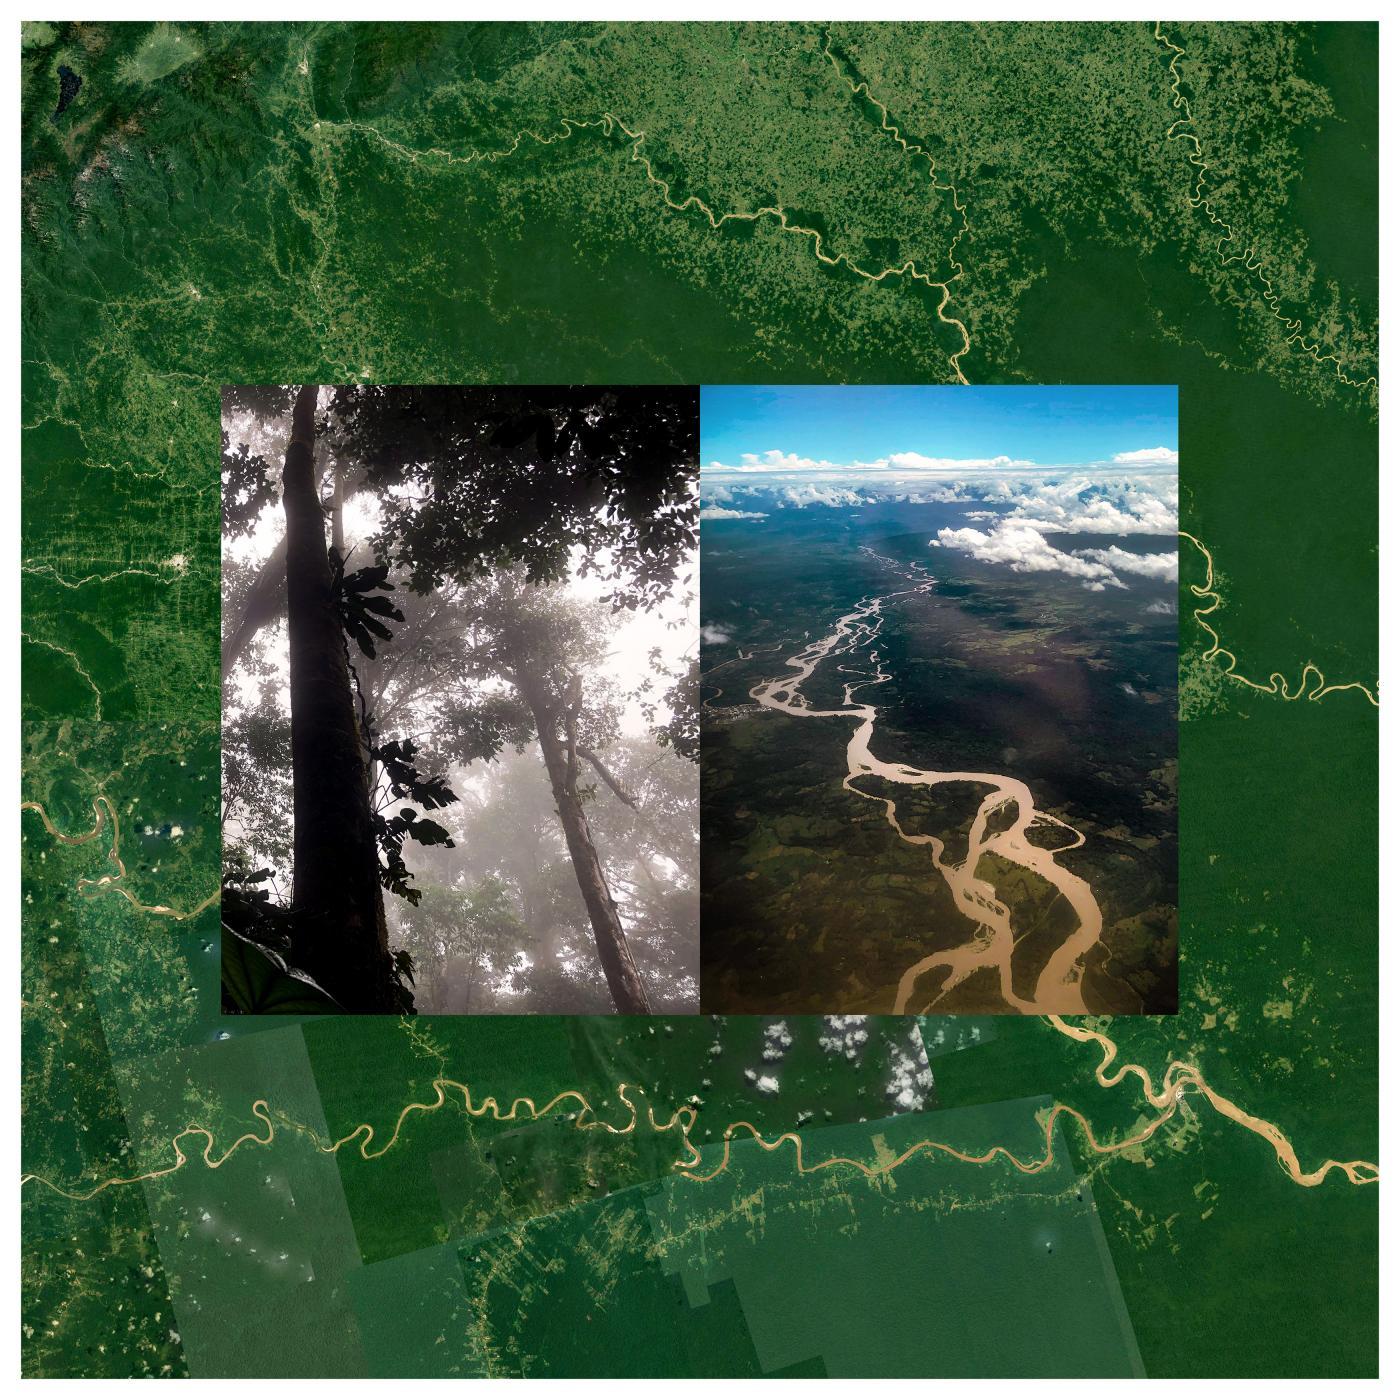 Cartographies of the Unseen (2018) - Felipe Castelblanco